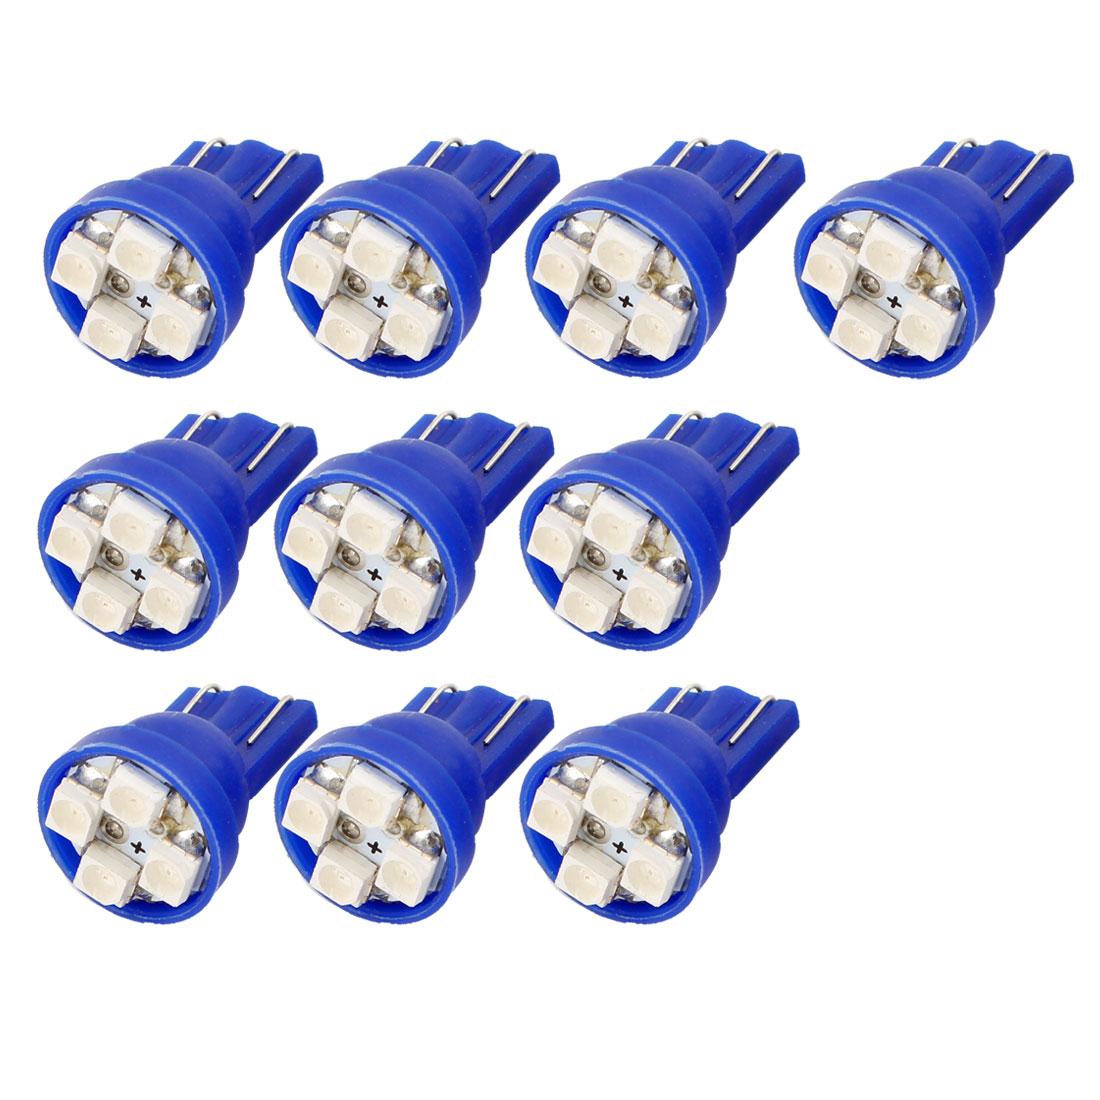 Unique Bargains Blue T10 194 192 W5W 1210 SMD 4 LEDs Bulbs Interior Side Wedge Light 10PCS